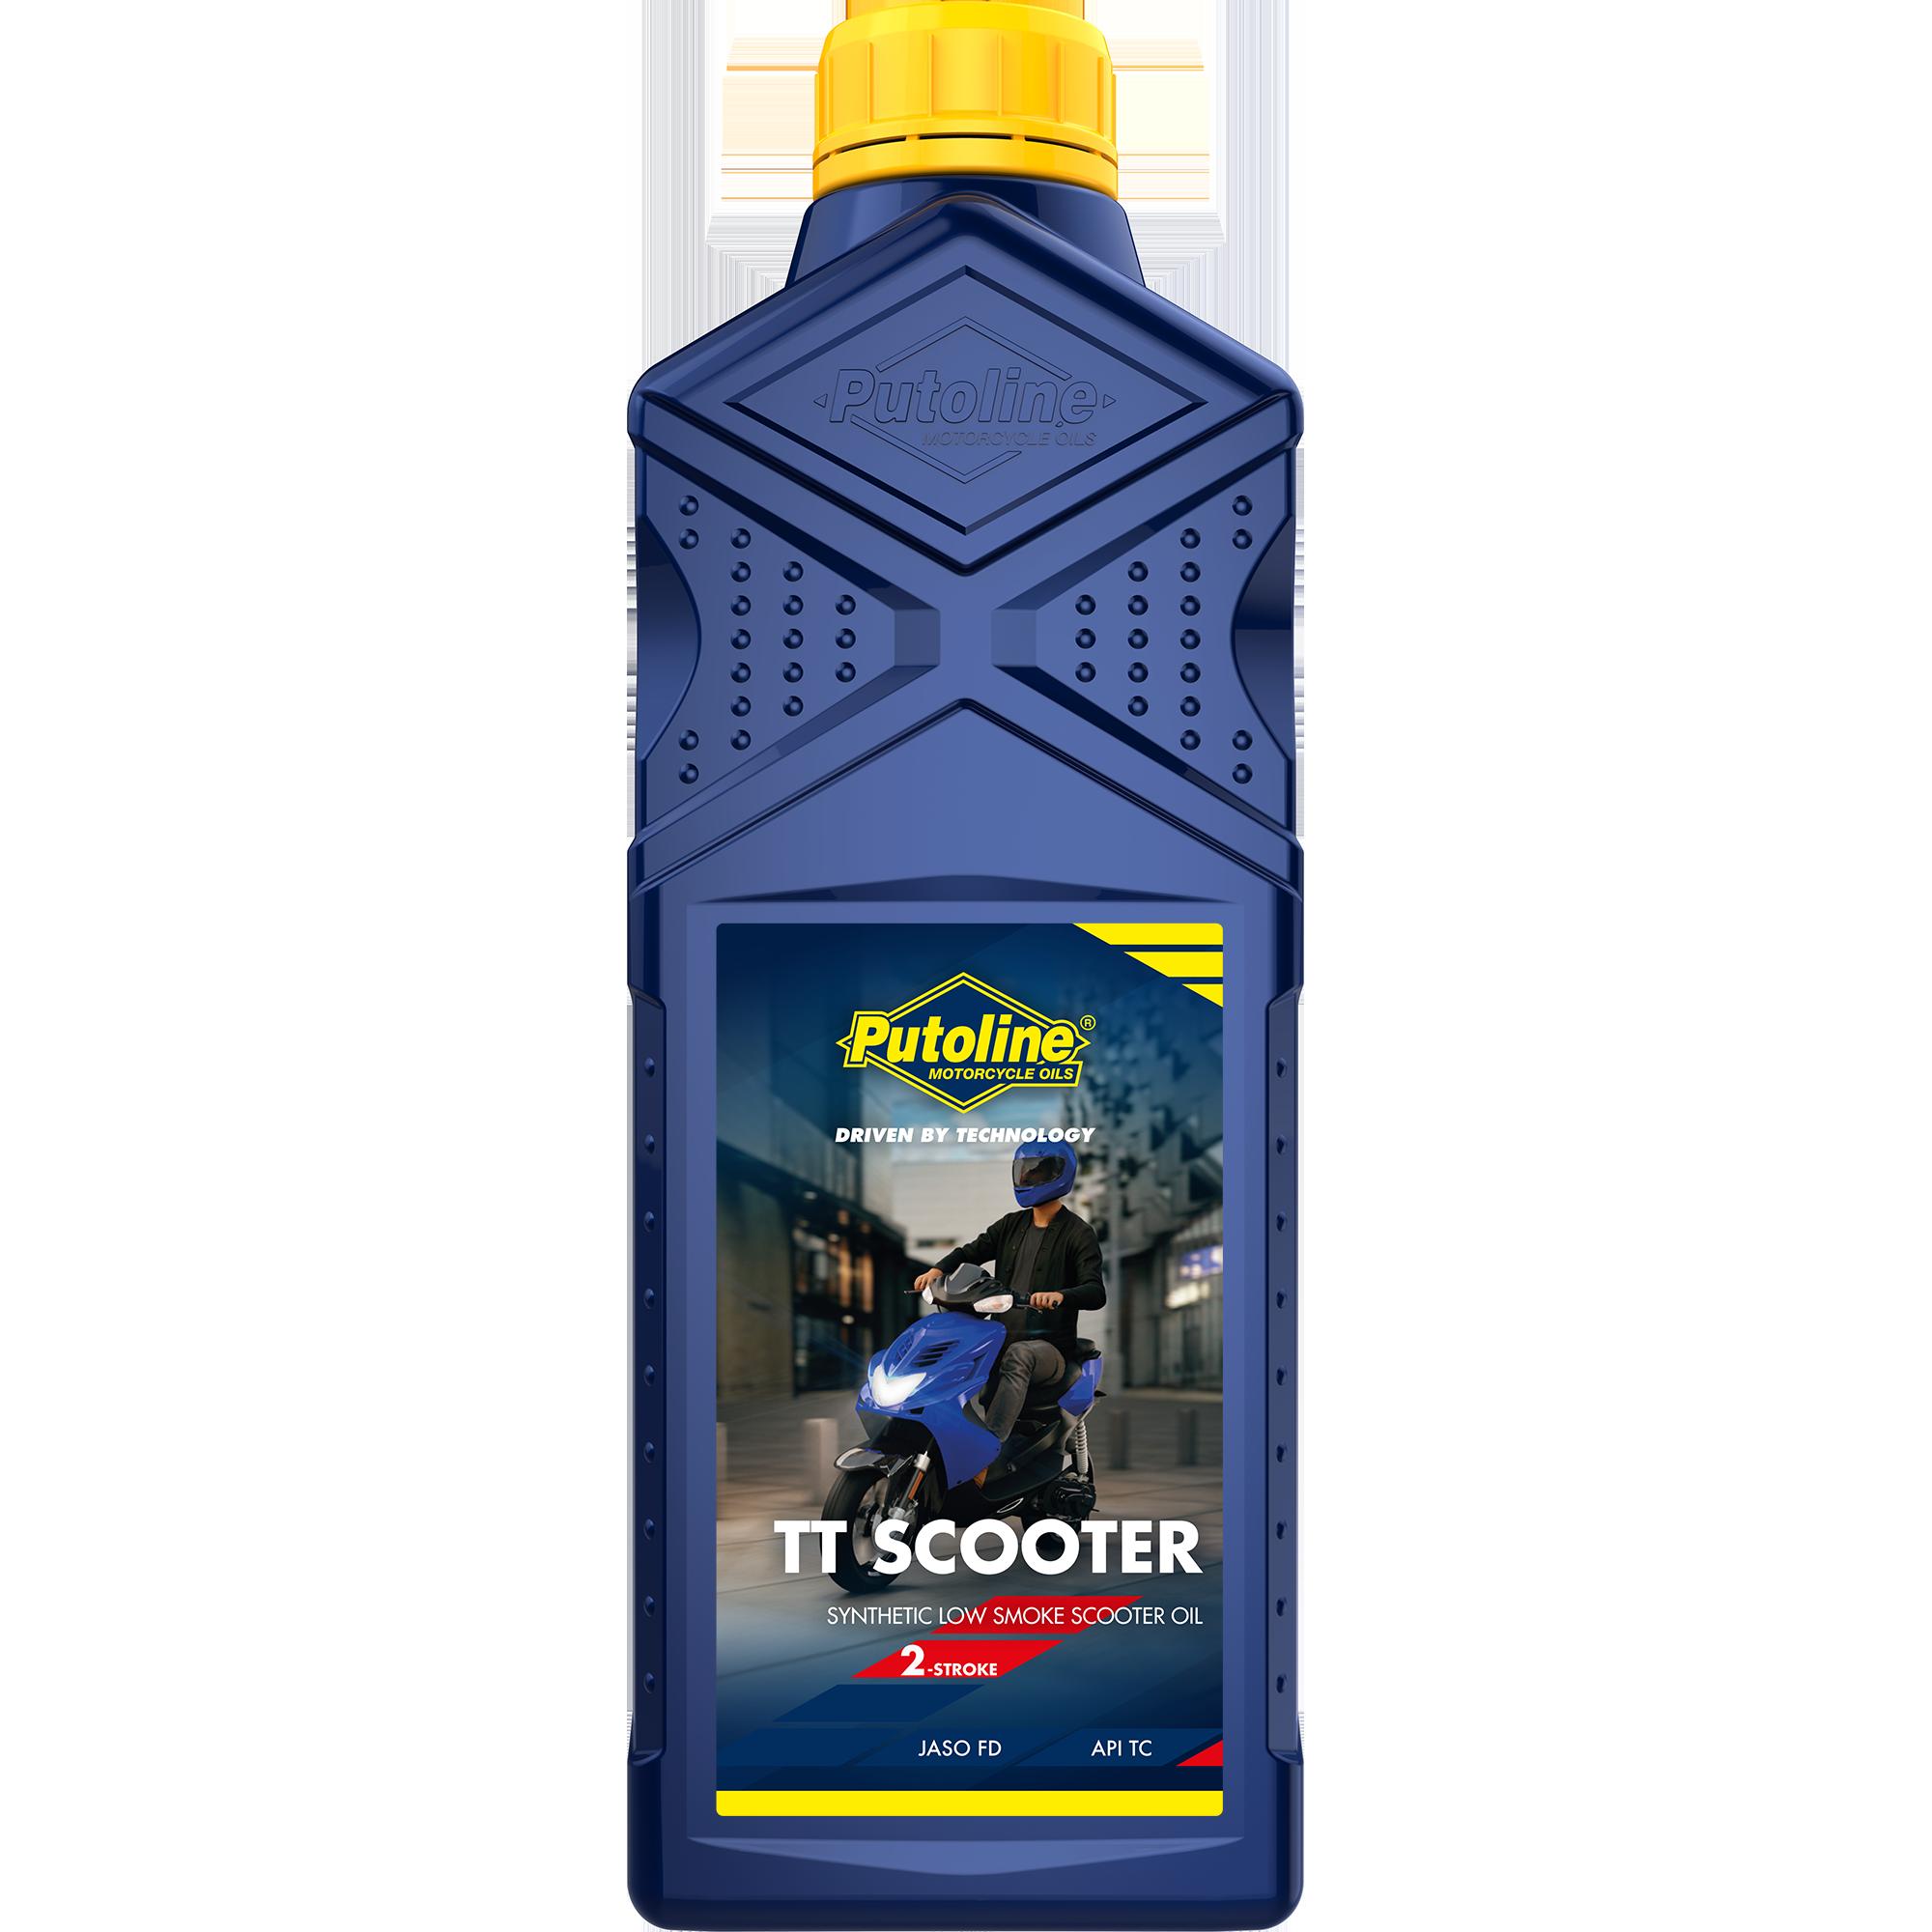 Putoline Motoröl TT Scooter 1L